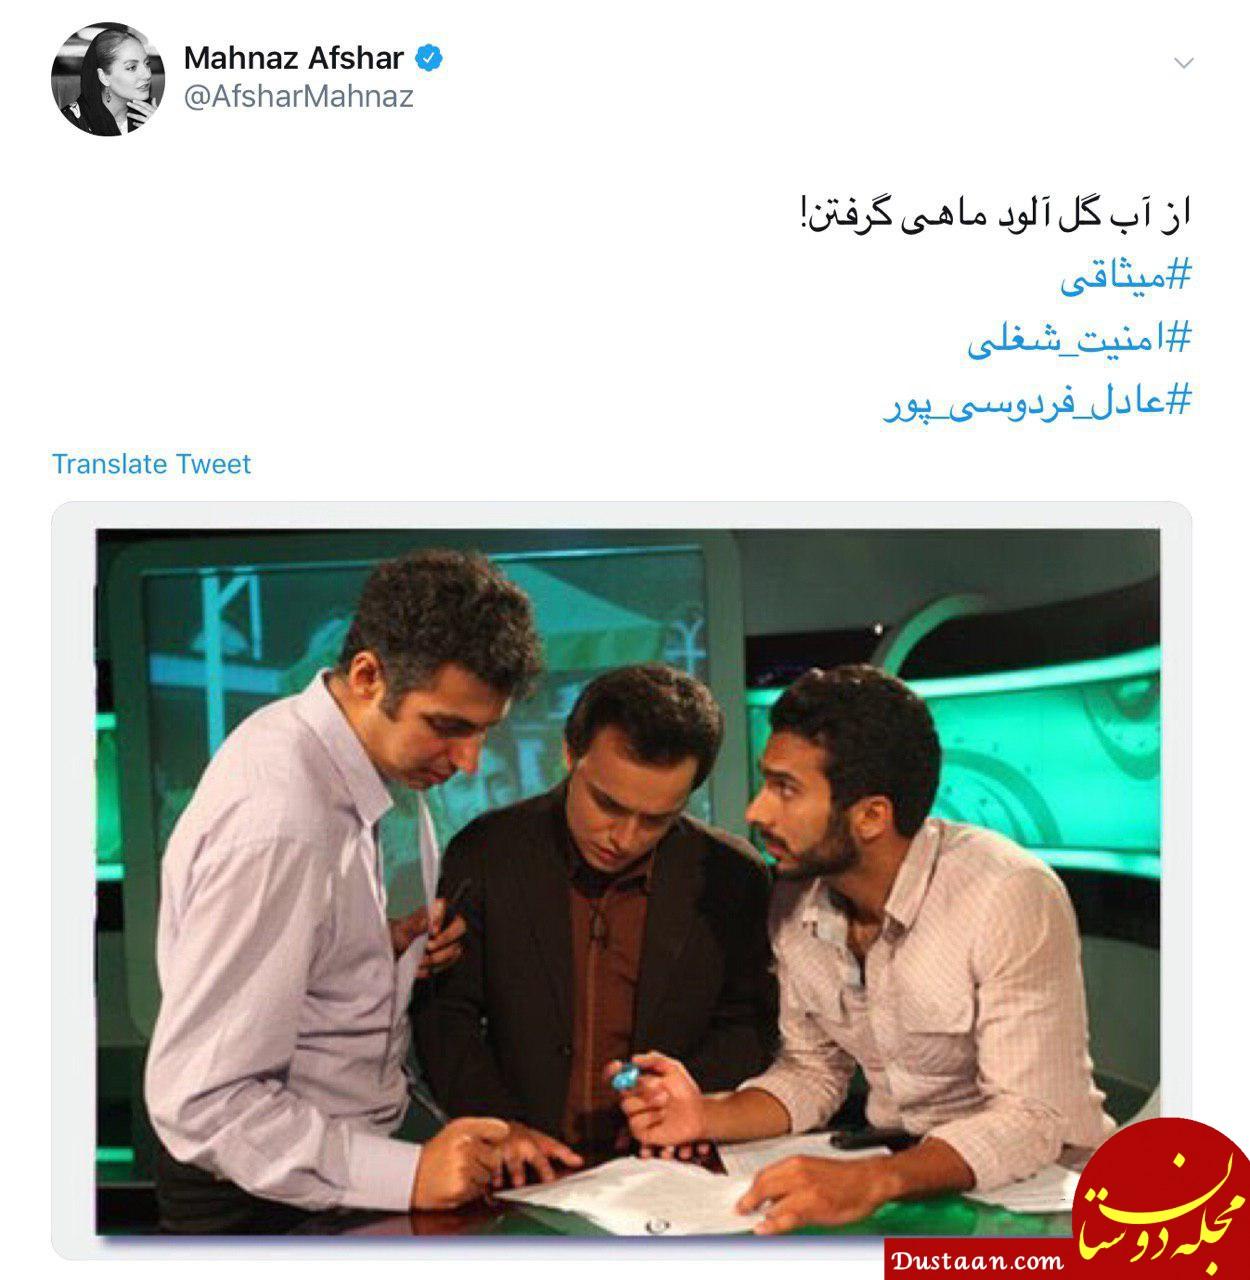 www.dustaan.com کنایه سنگین توییتری مهناز افشار به محمدحسین میثاقی!